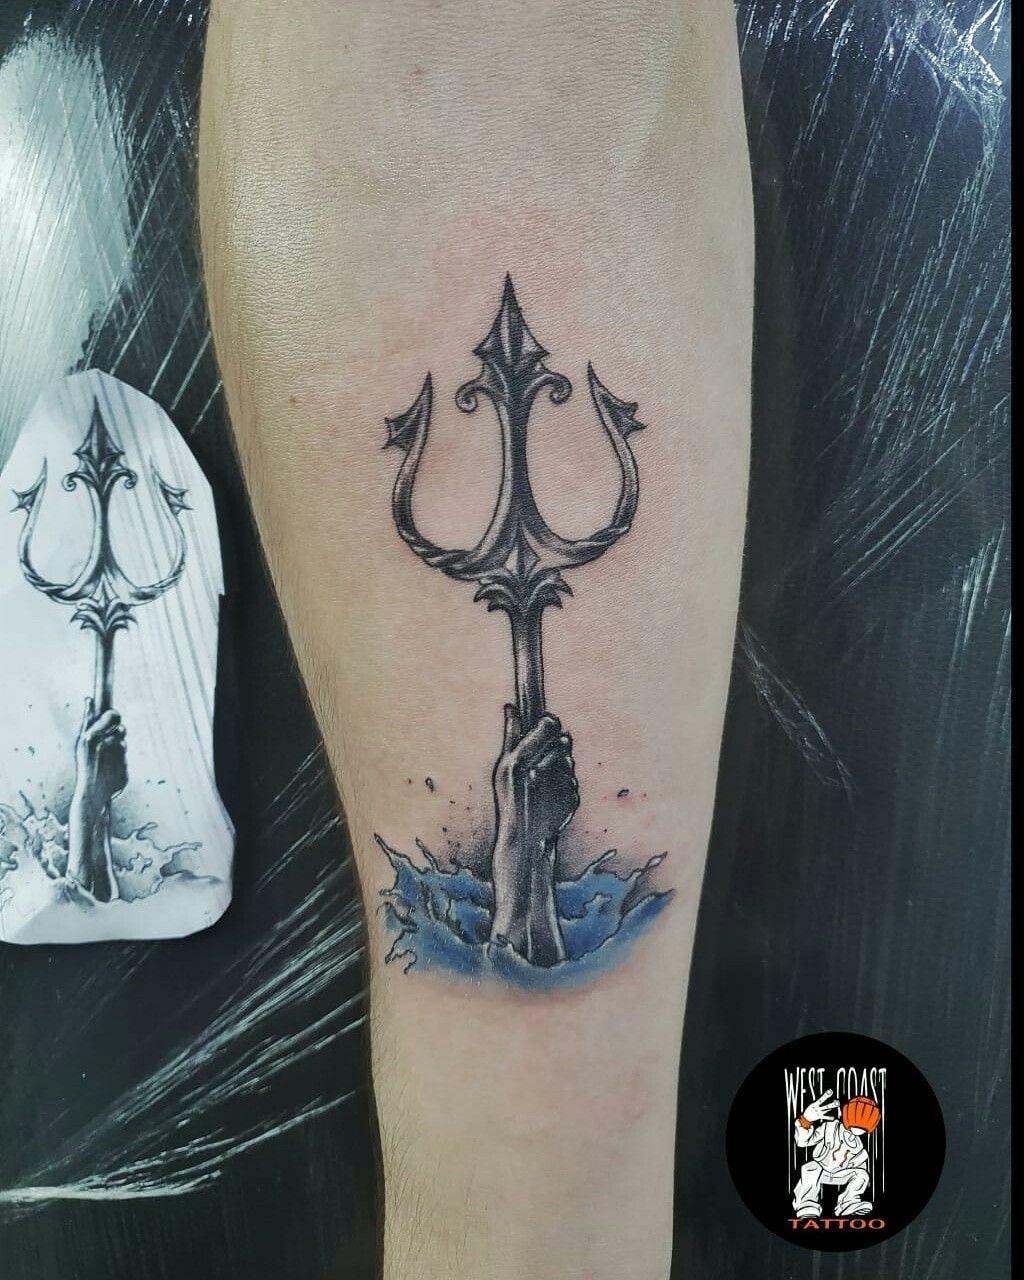 #tattoo #tattoos #tat #ink #inked #envywear #tattooed #tattoist #coverup #art #design #instaart #instagood #sleevetattoo #handtattoo #chesttattoo #photooftheday #tatted #instatattoo #bodyart #tatts #tats #amazingink #tattedup #inkedup #dövmeler #dövmestüdyosu #dövmesanatı #istanbul #istanbultattoo #yeditepeüniversitesi#tattoo ##tattoos ##tat ##ink ##inked ##envywear ##tattooed ##tattoist ##coverup ##art ##design ##instaart ##instagood ##sleevetattoo ##handtattoo ##chesttattoo ##photooftheday ##t